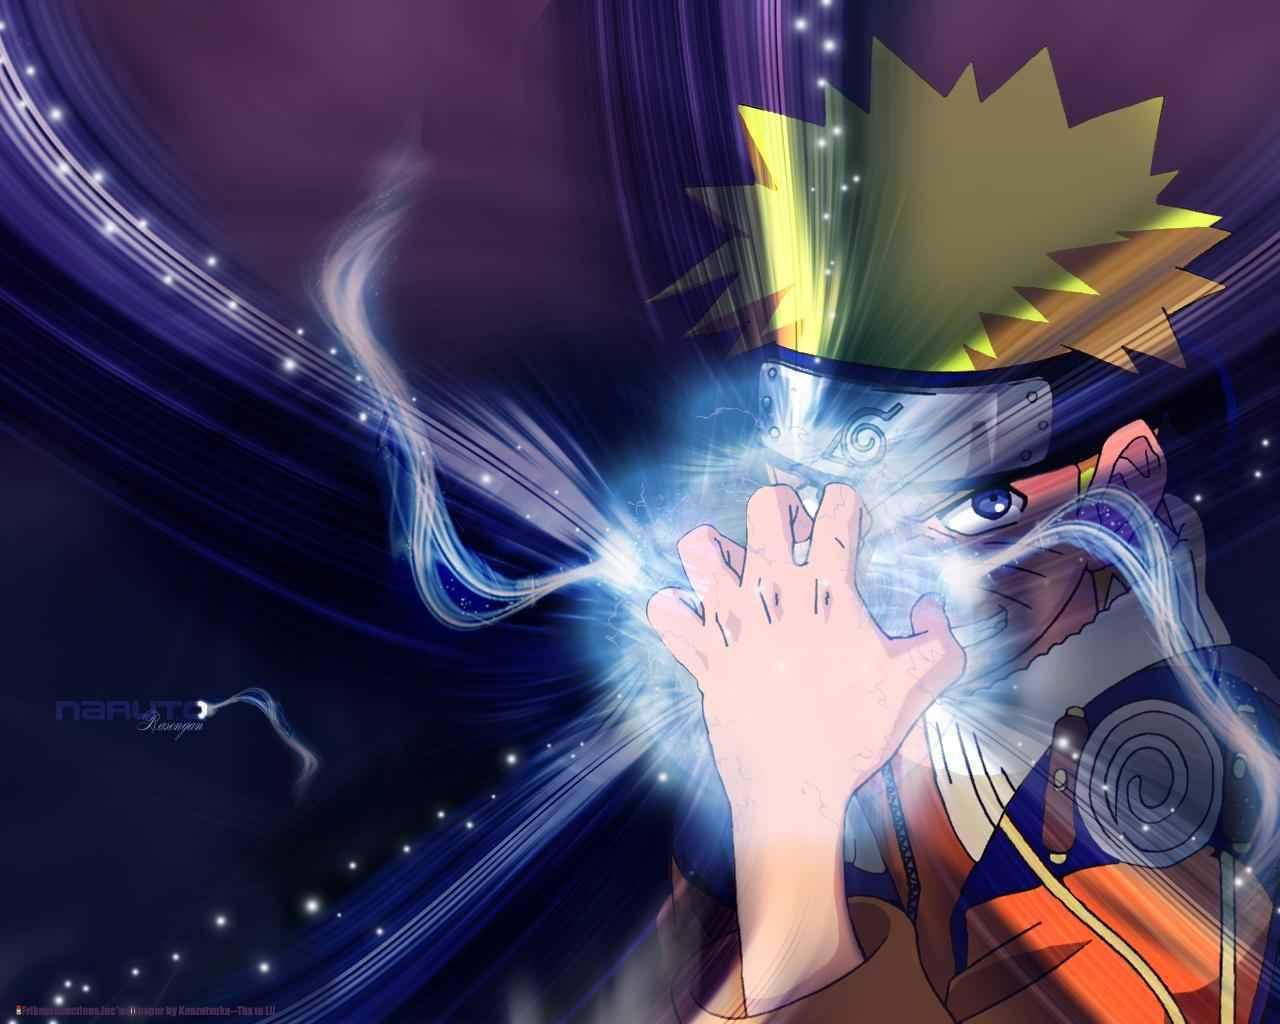 Naruto Vs Sasuke Rasengan Vs Chidori 9734 Hd Wallpapers in Anime 1280x1024